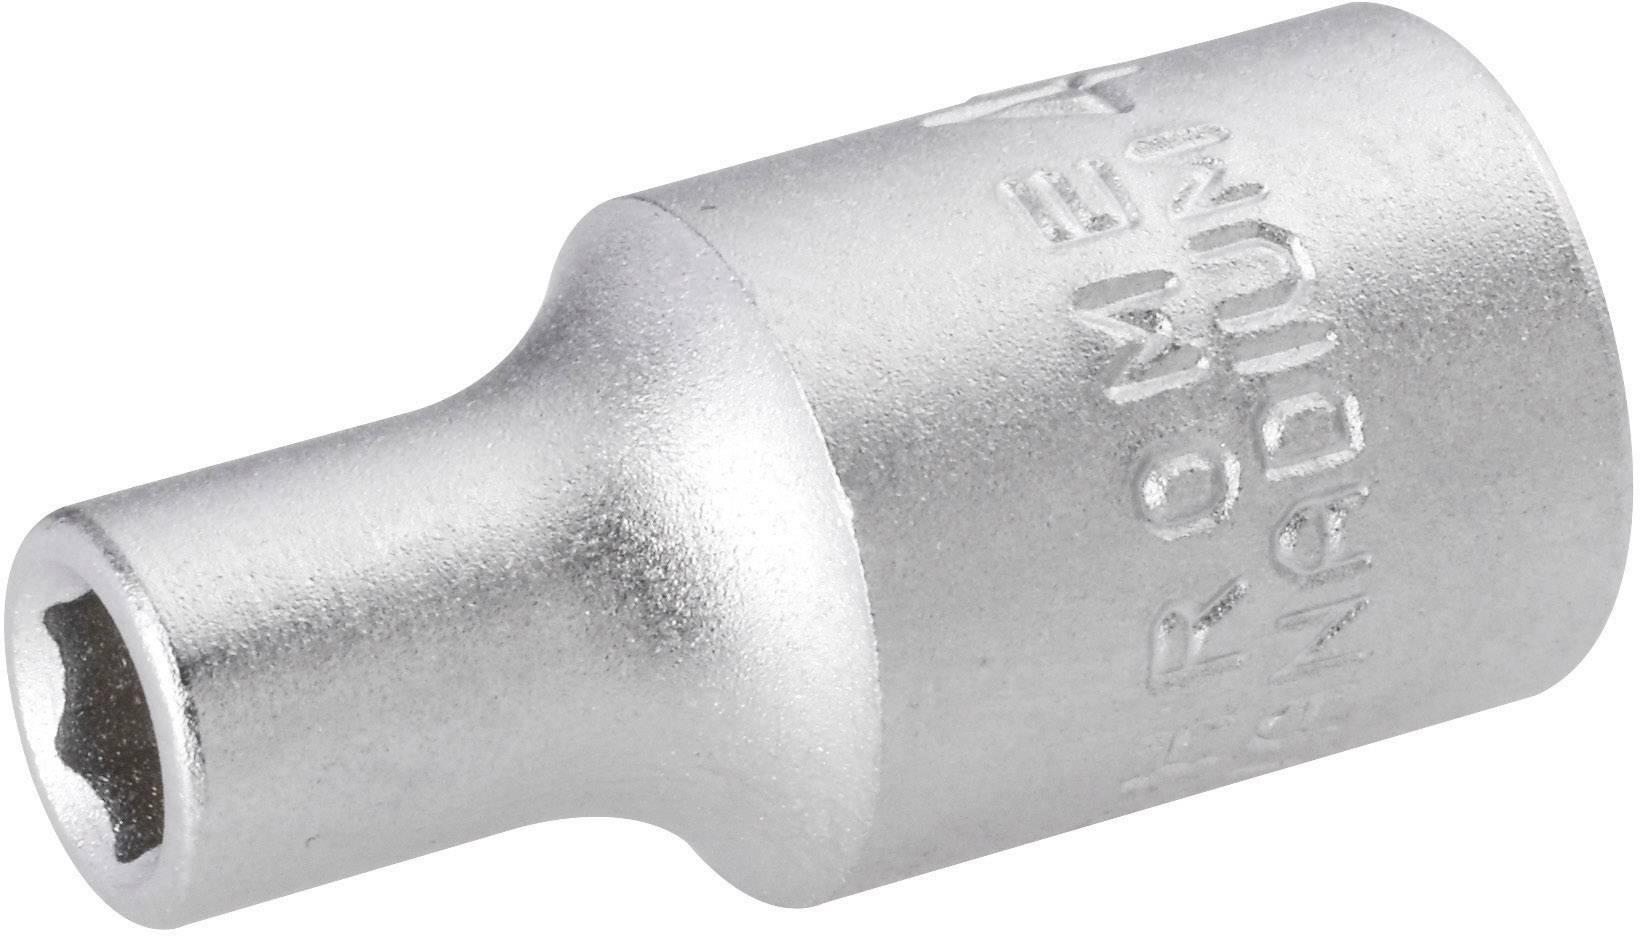 "Nástavec na račňu TOOLCRAFT 820753, vonkajší šesťhran, 1/4"" (6,3 mm), 13 mm, chróm-vanadiová oceľ"